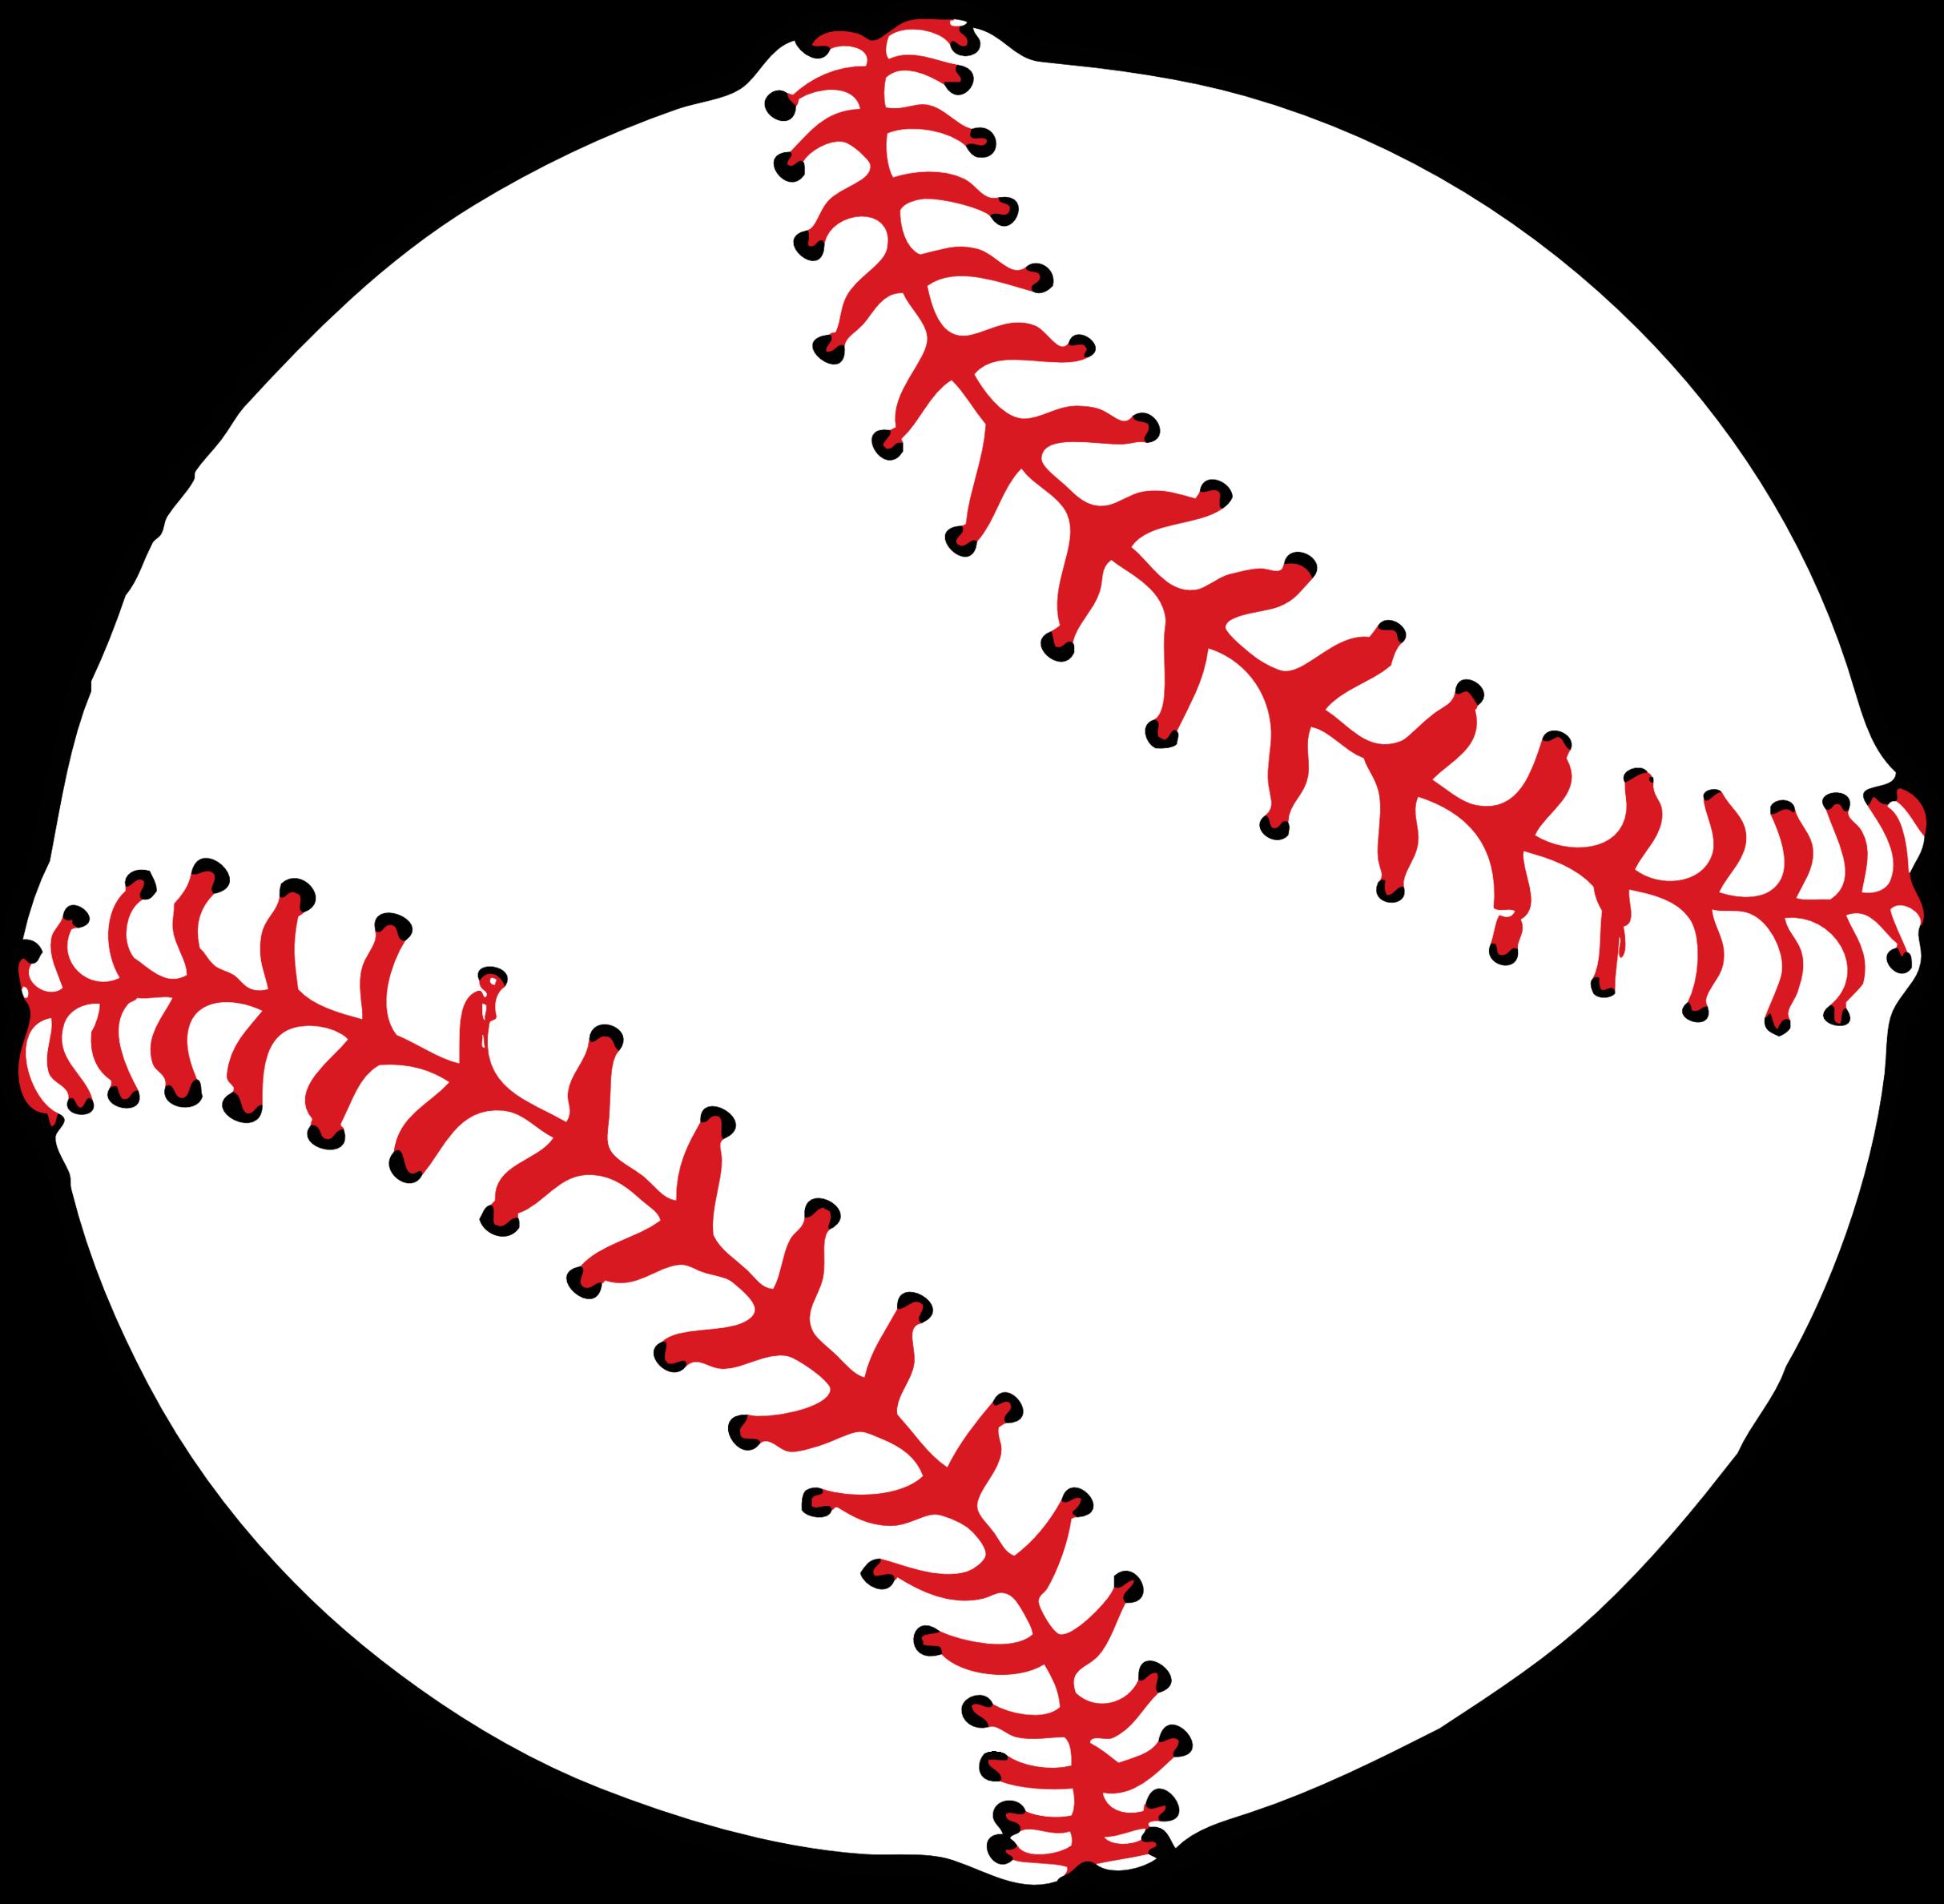 Baseball diamond clipart creative commons banner Free Summer Baseball Cliparts, Download Free Clip Art, Free Clip Art ... banner